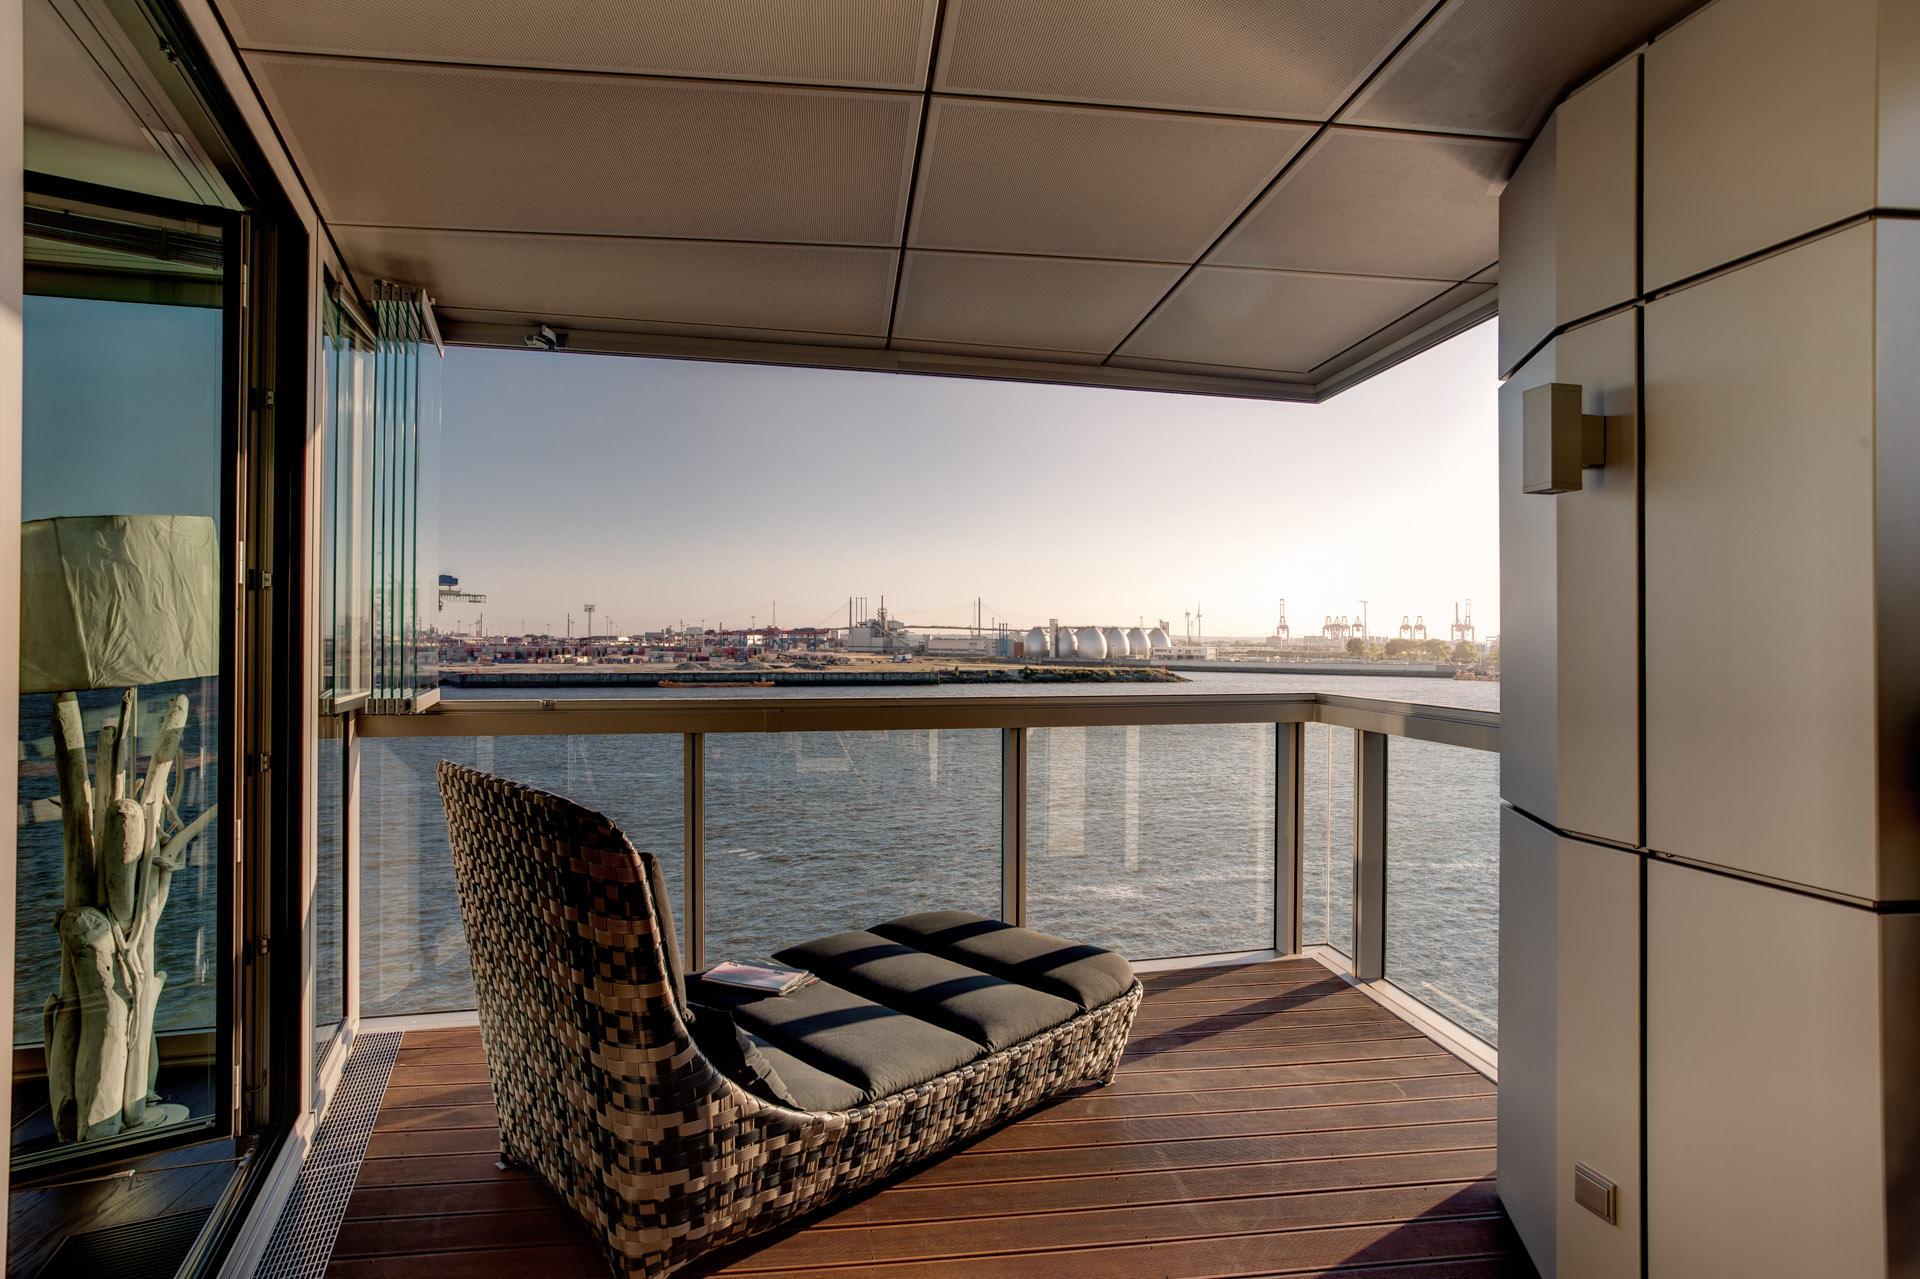 solarlux balkonverglasung in hamburg schulze braak. Black Bedroom Furniture Sets. Home Design Ideas